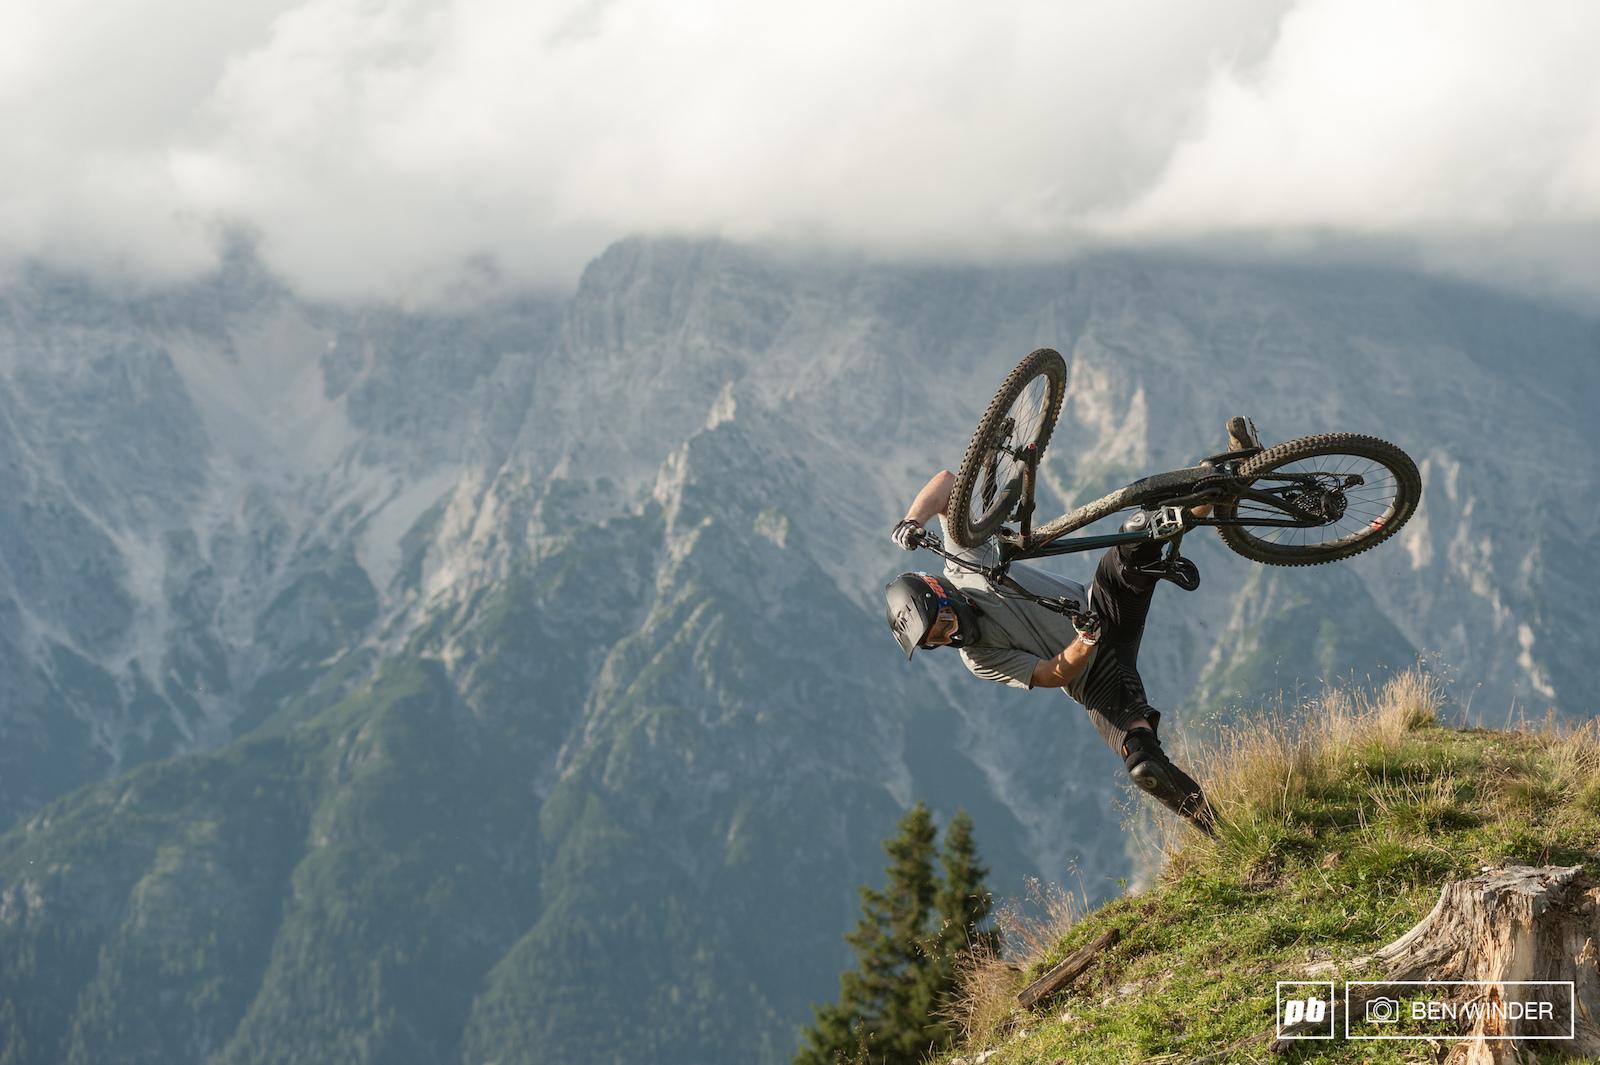 A karate professional attempting mountain biking. 1 10 for thigh gap.